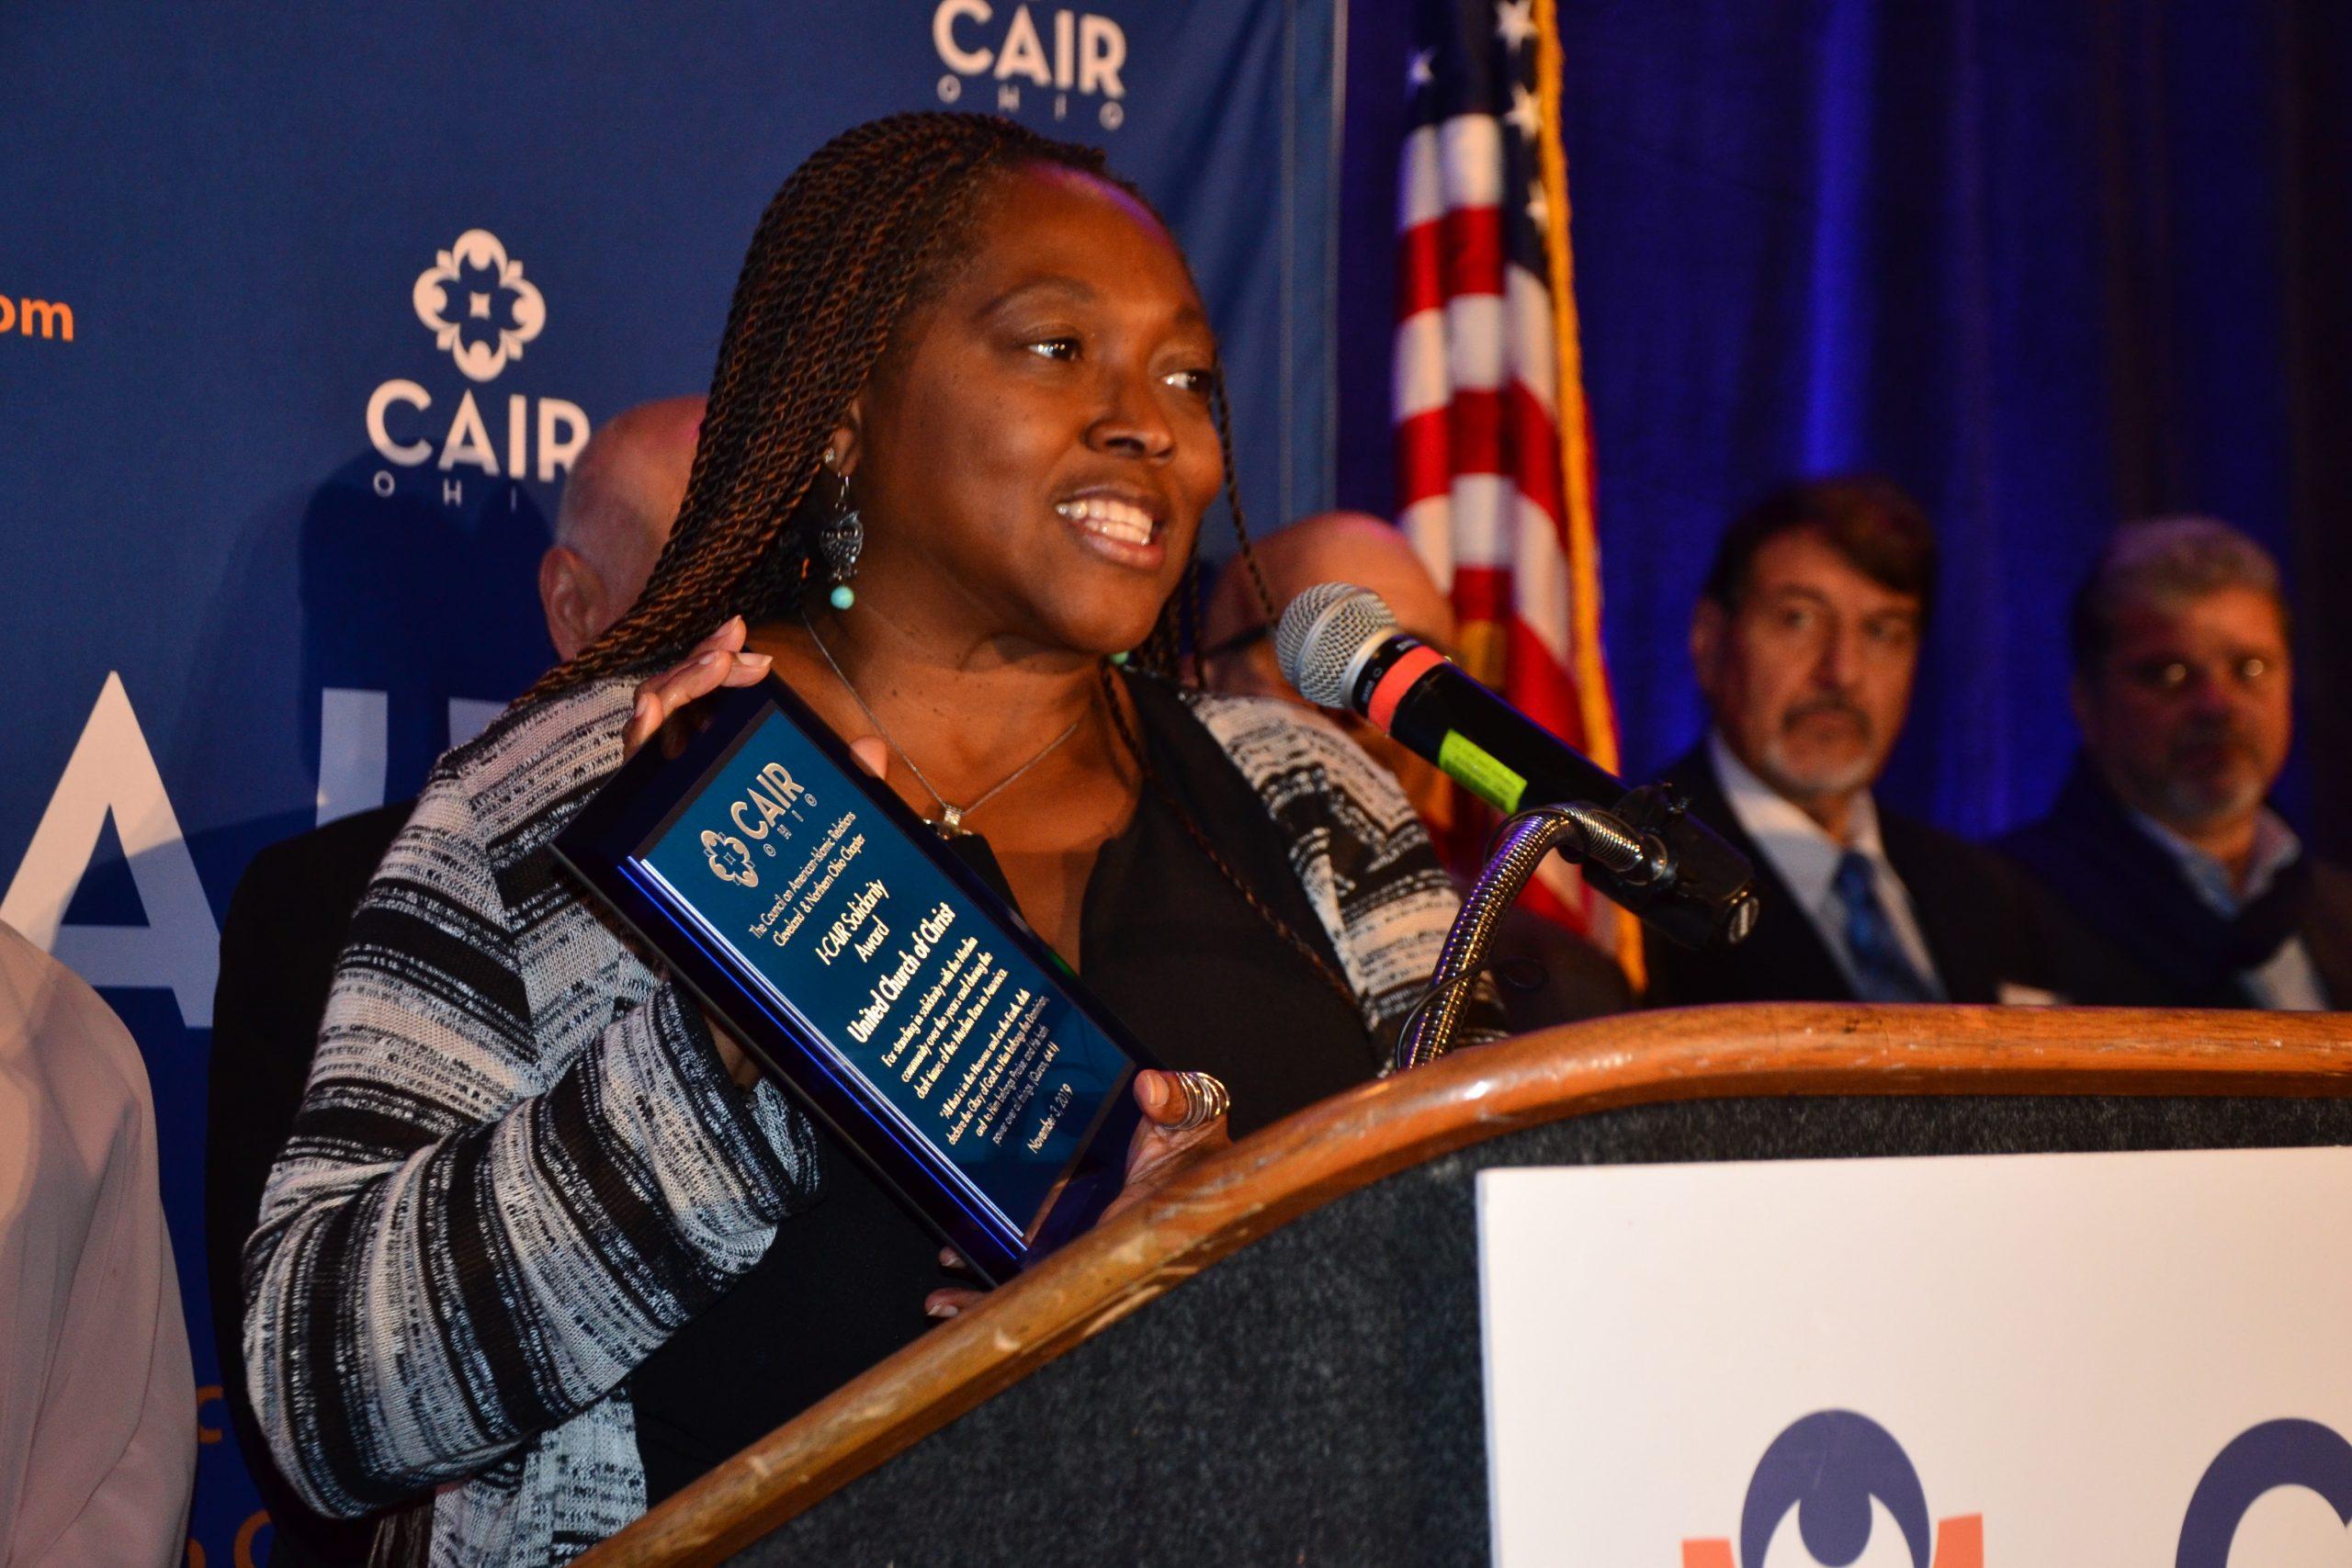 CAIR award to UCC 11/3/19 K.G. Thompson